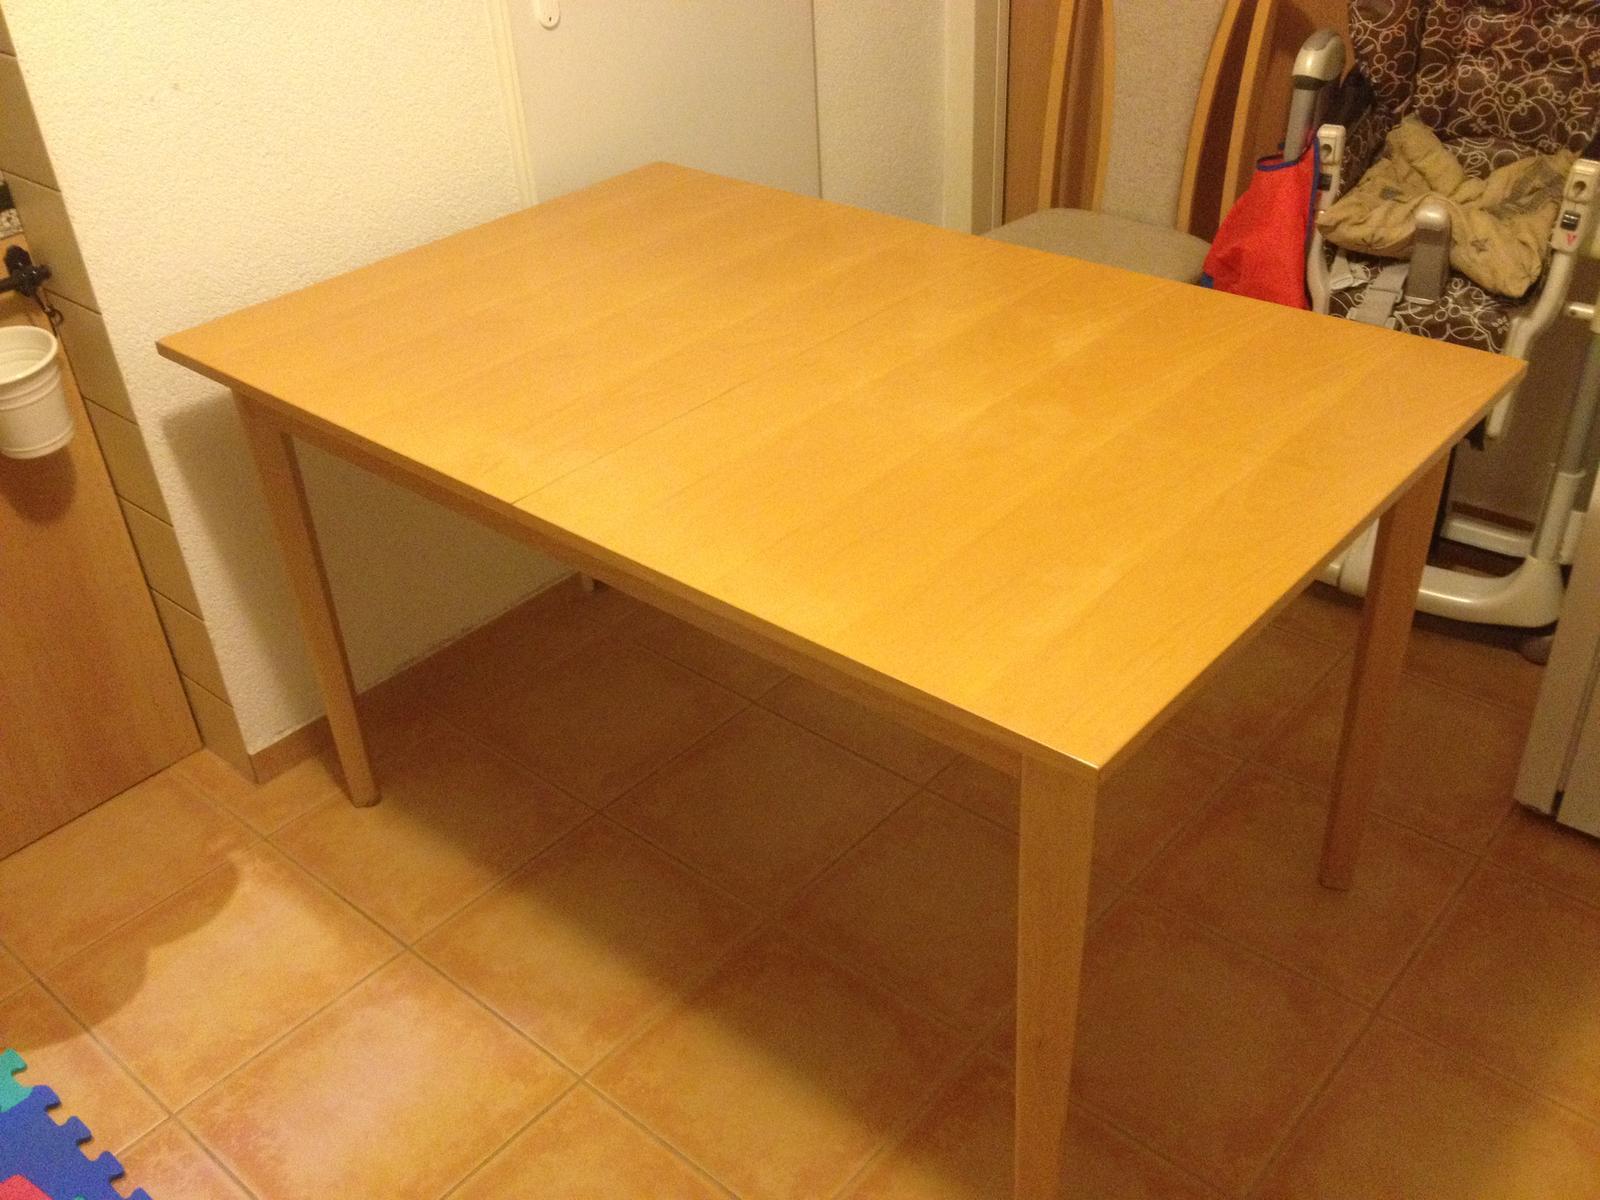 Rozťahovací drevený jedálenský stôl buk - Obrázok č. 1